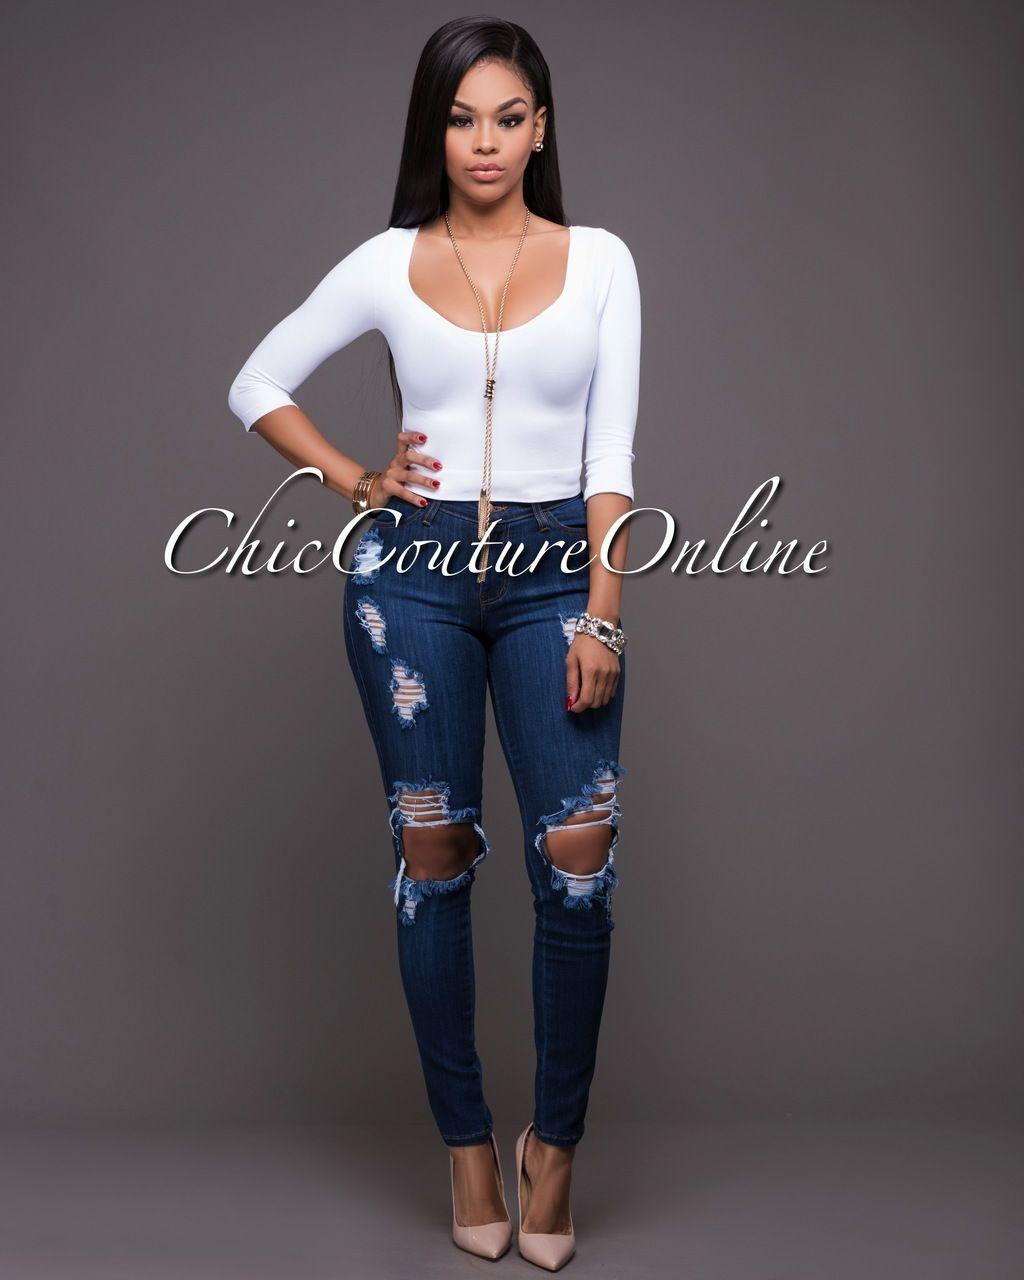 d80660479ec1 Chic Couture Online - Maverick Dark Wash Denim Destroyed Jeans